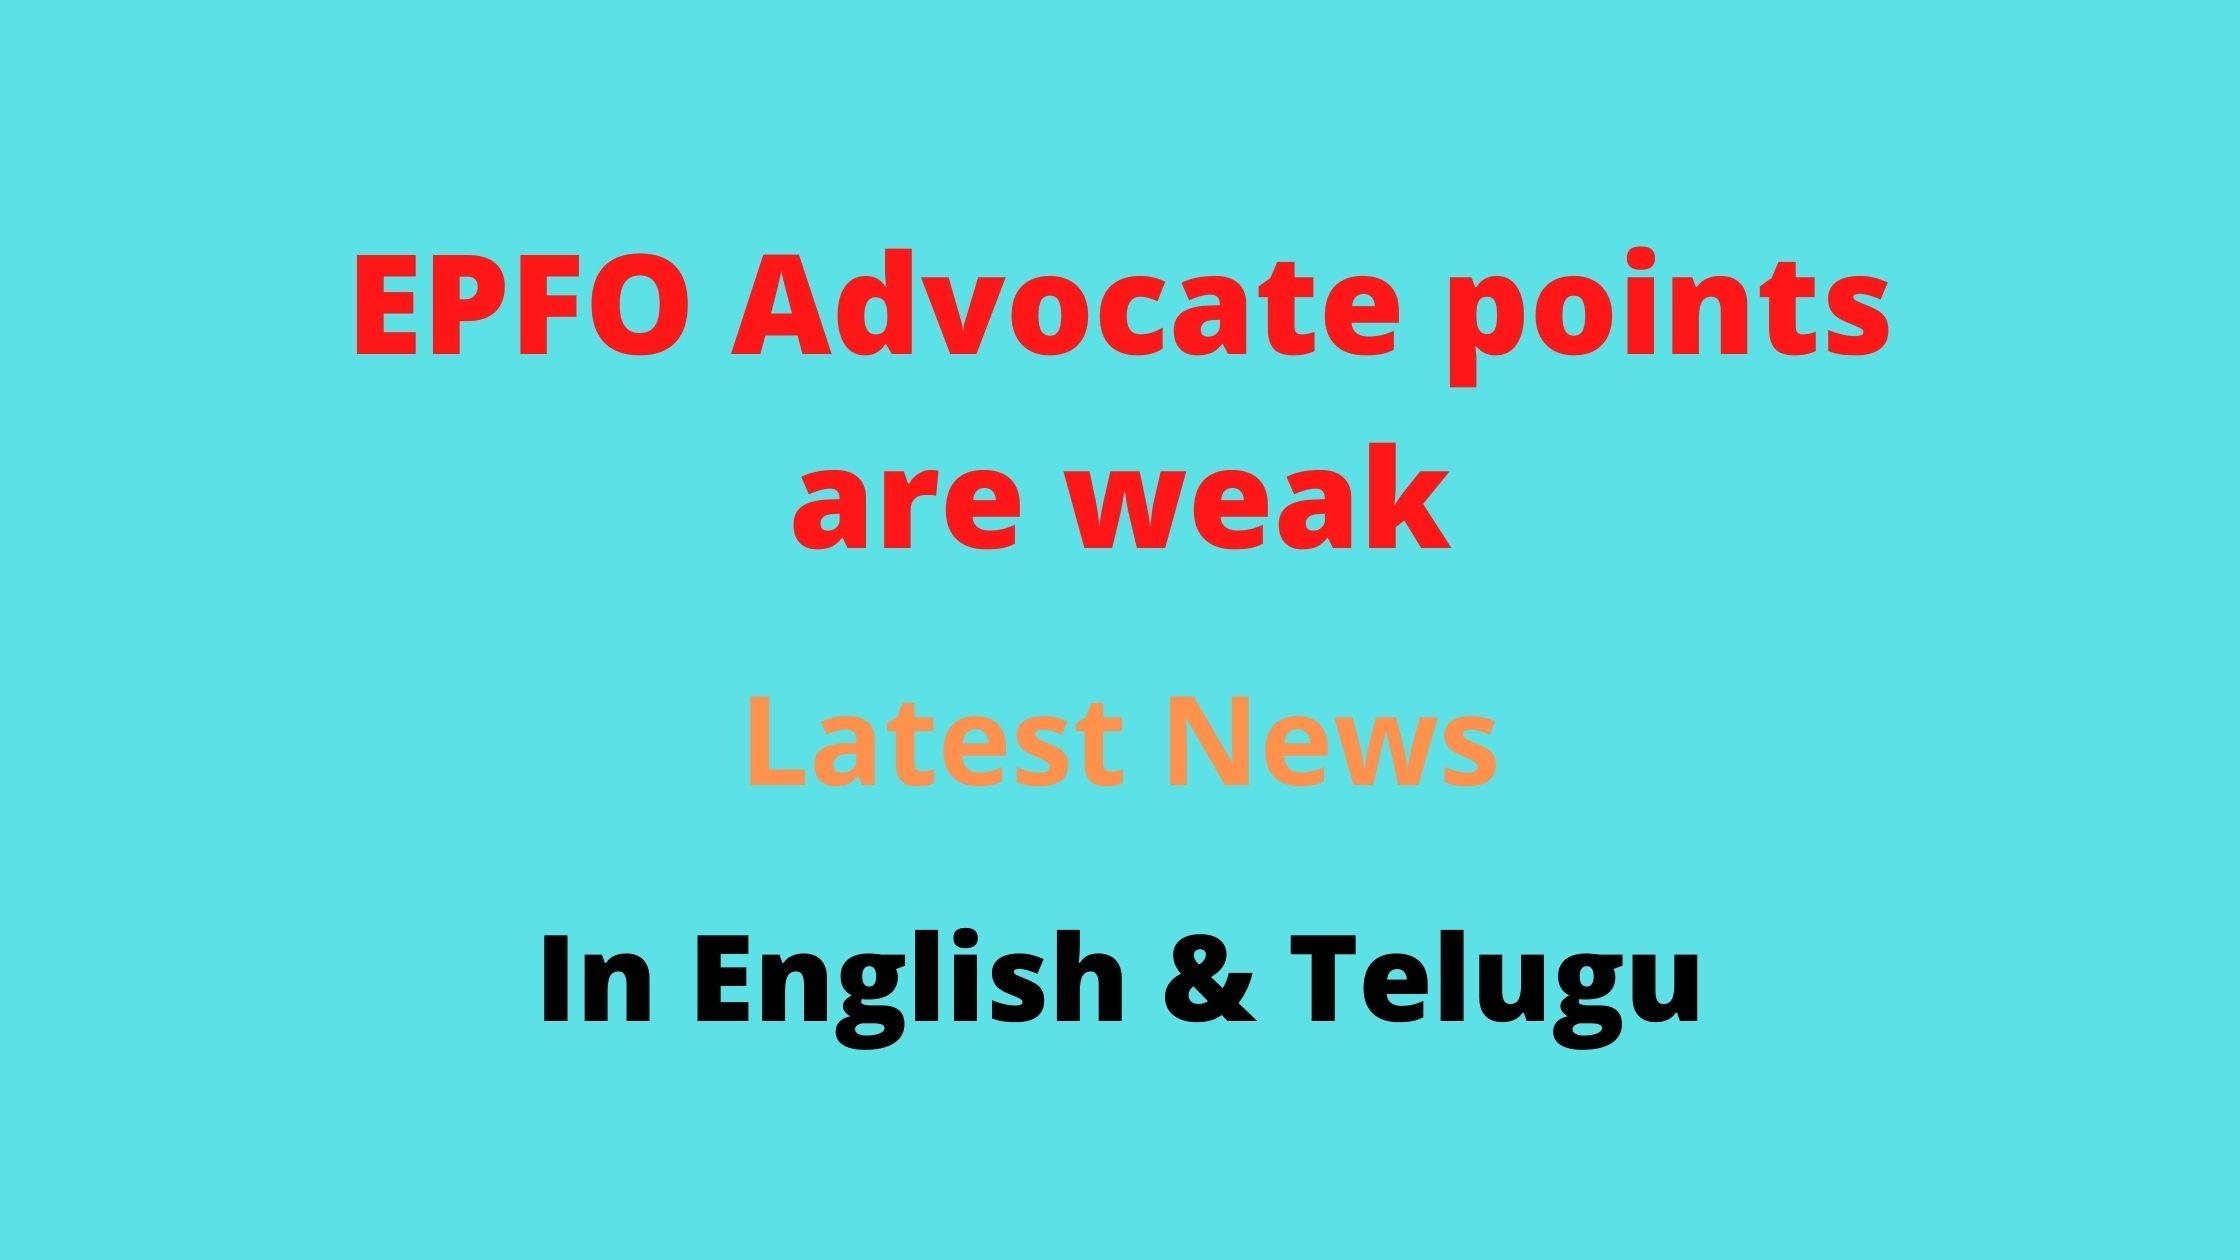 EPFO Advocate points are weak